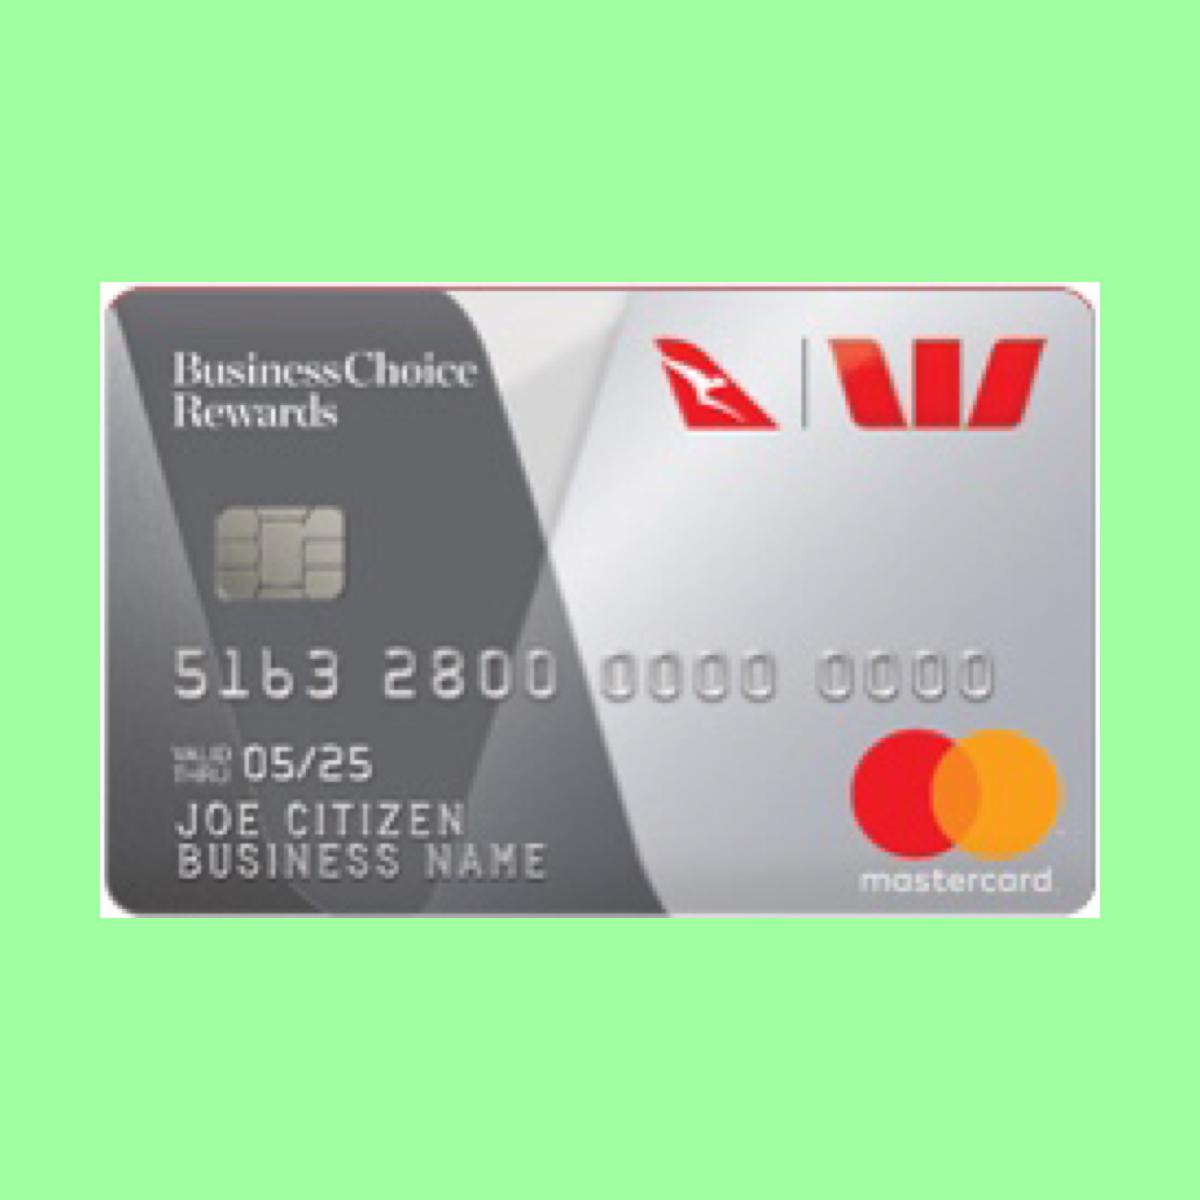 Westpac Businesschoice Platinum Card Qantas Calculator Business Insurance Reward Card Business Names